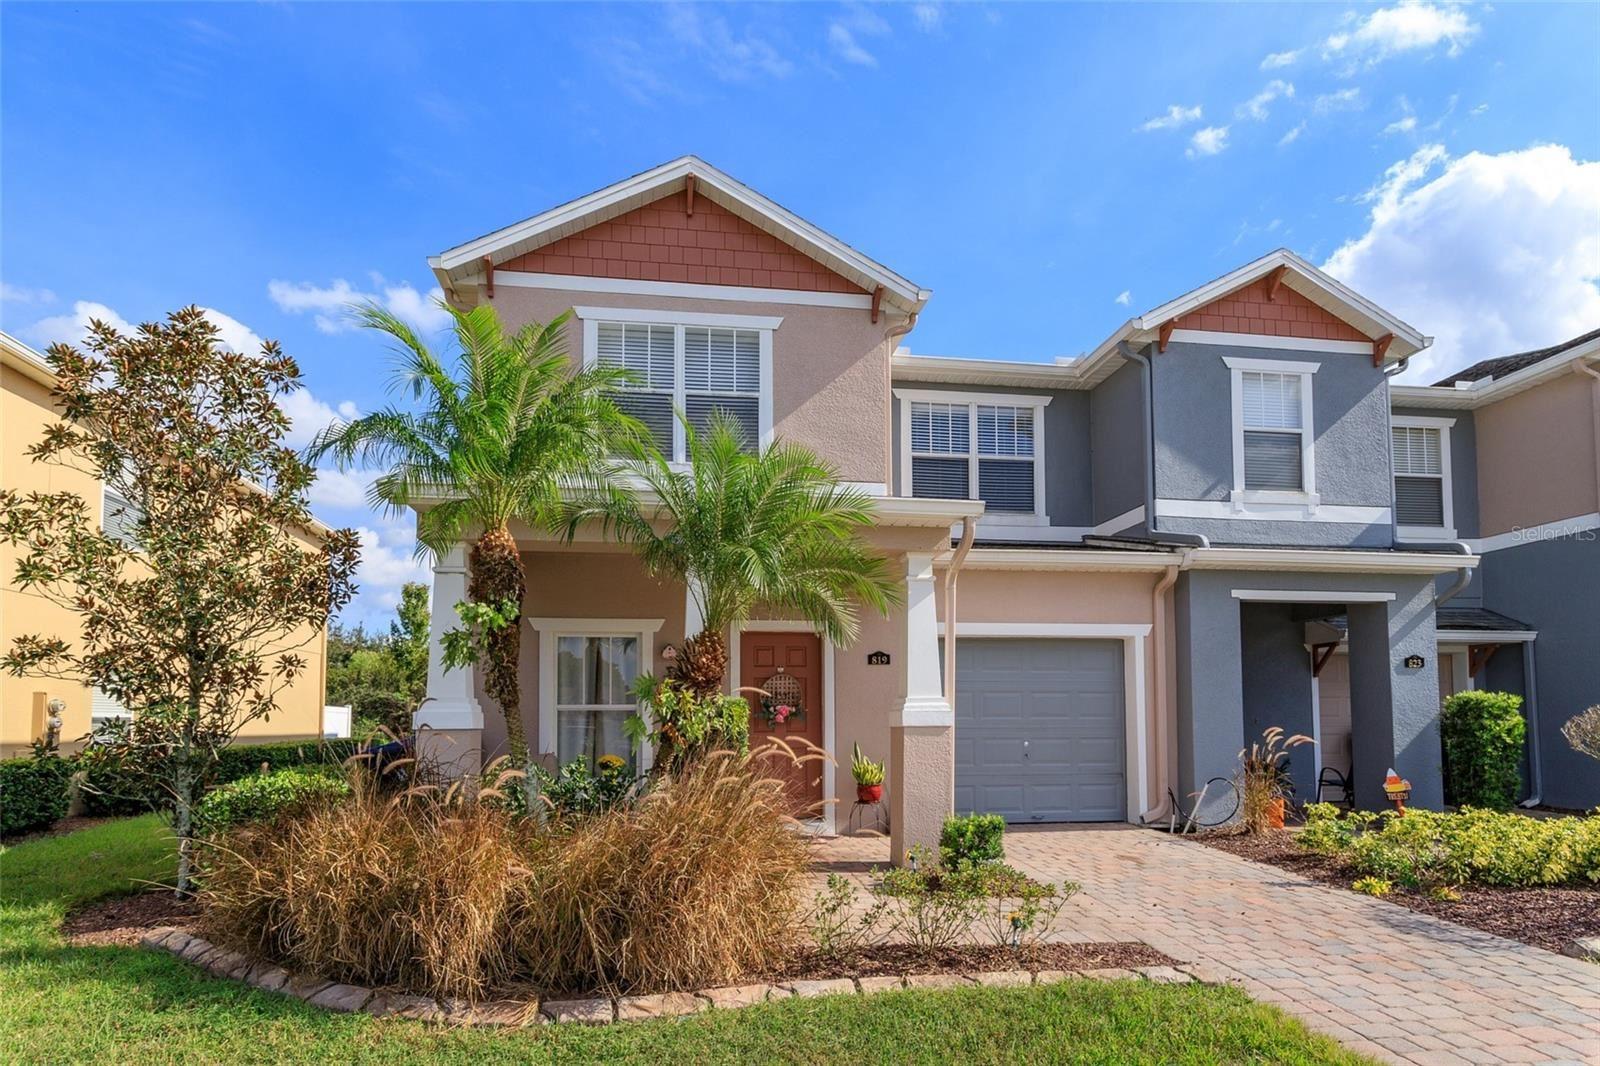 819 PINE POINTE LANE, Orlando, FL 32828 - #: O5981635